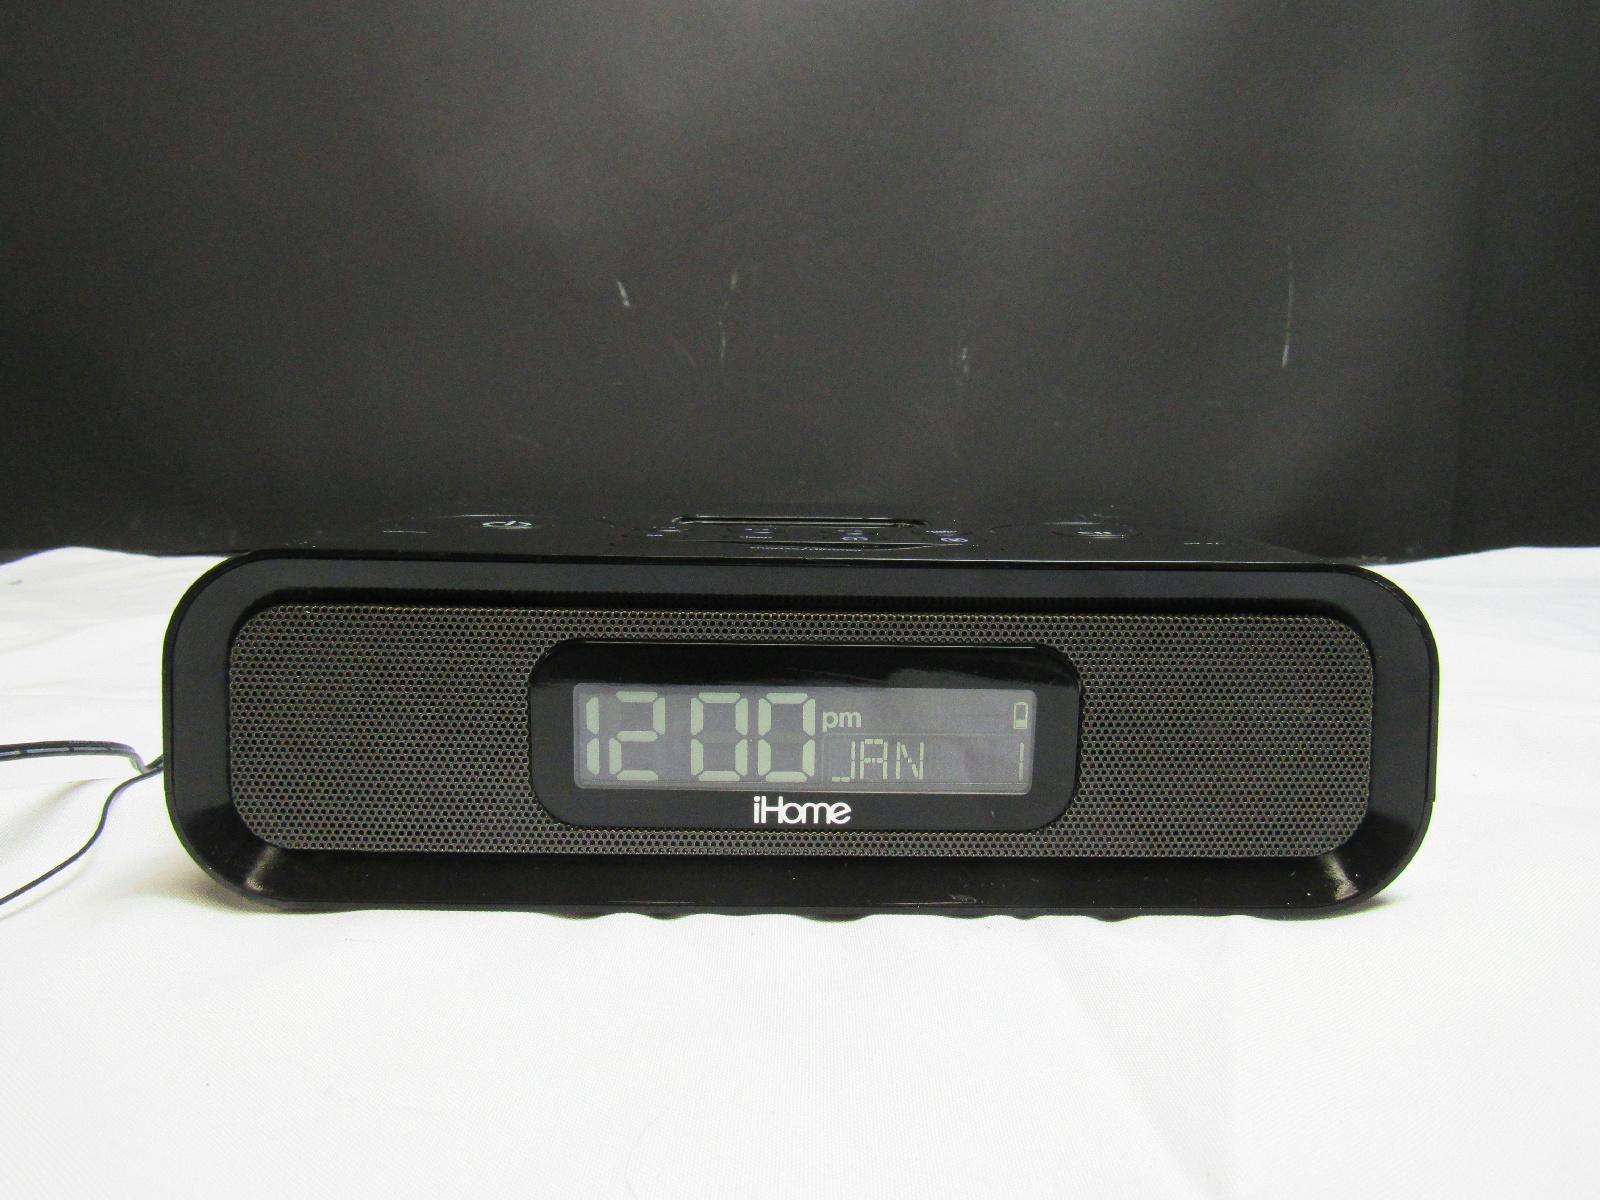 ihome model ip97 dual alarm clock radio ipod docking station ebay. Black Bedroom Furniture Sets. Home Design Ideas